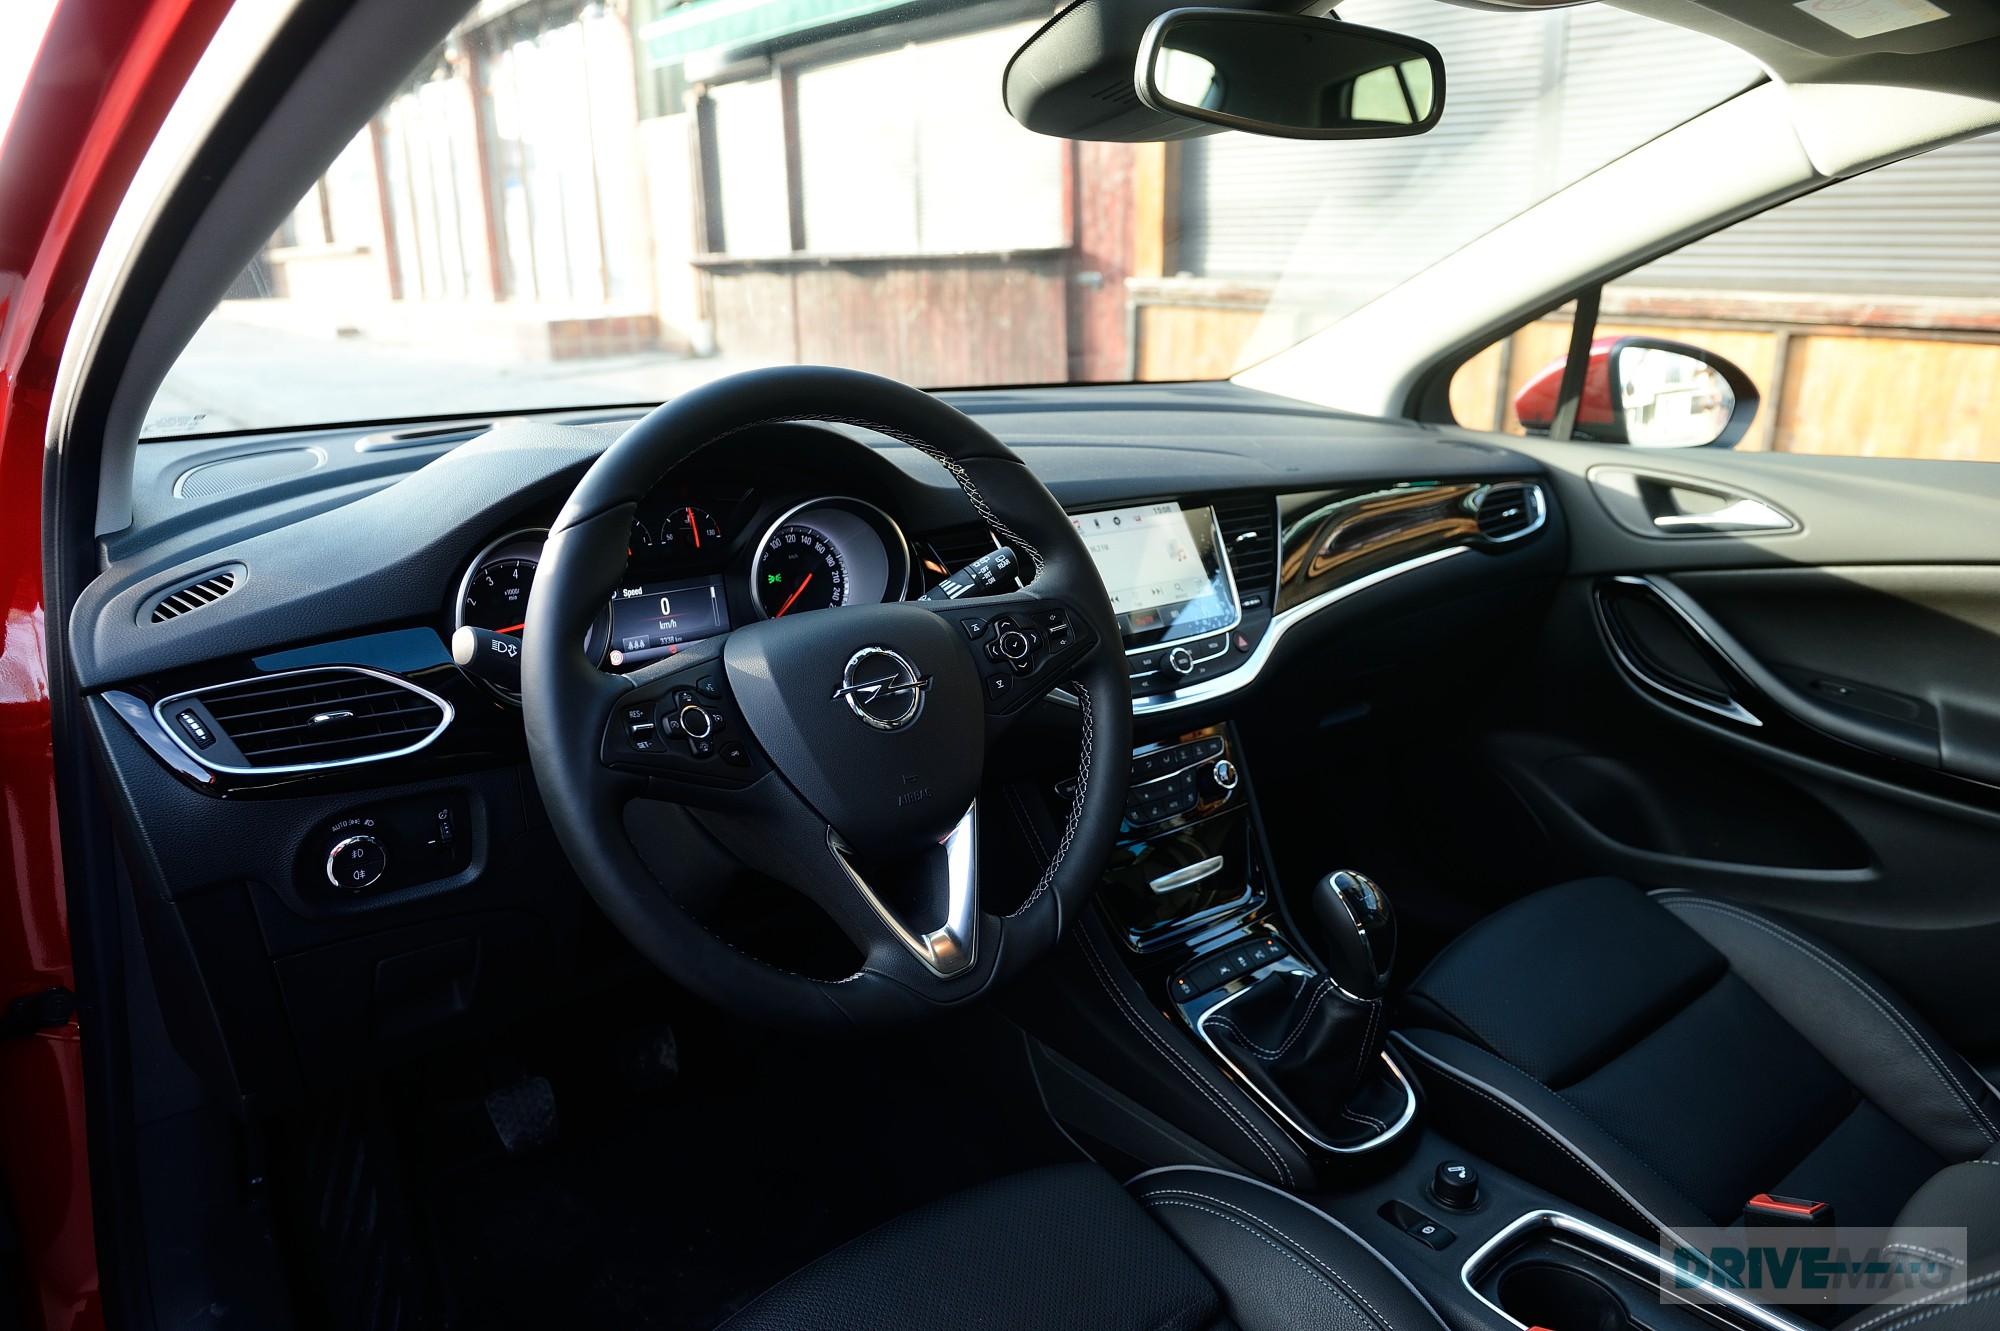 2015 Opel Astra K Test Drive Making Headway